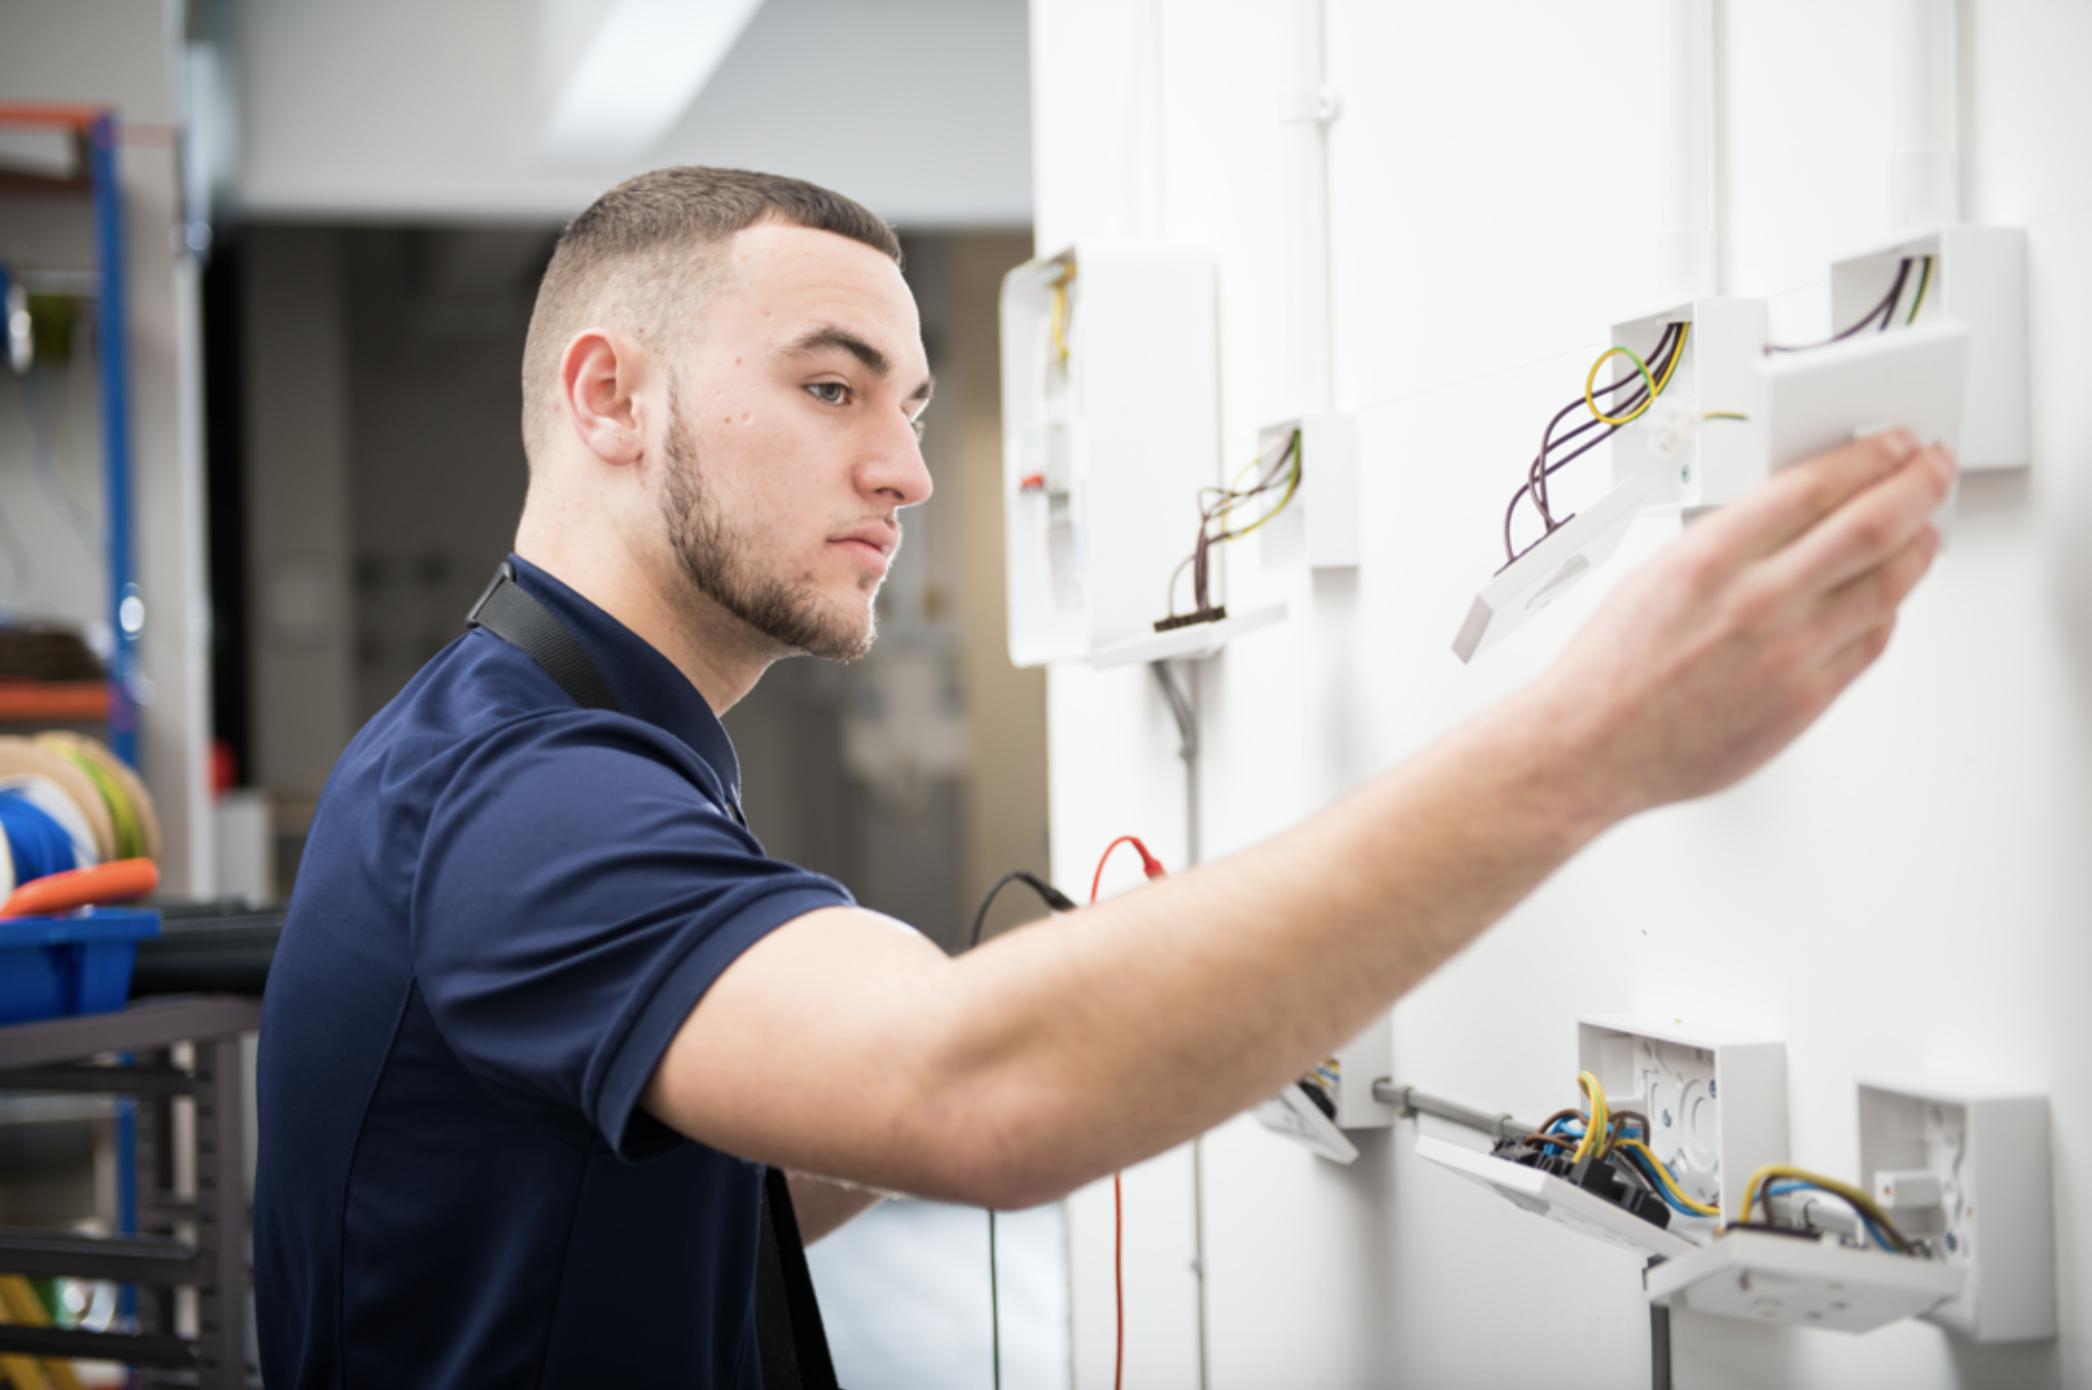 JTL Electrician apprentice